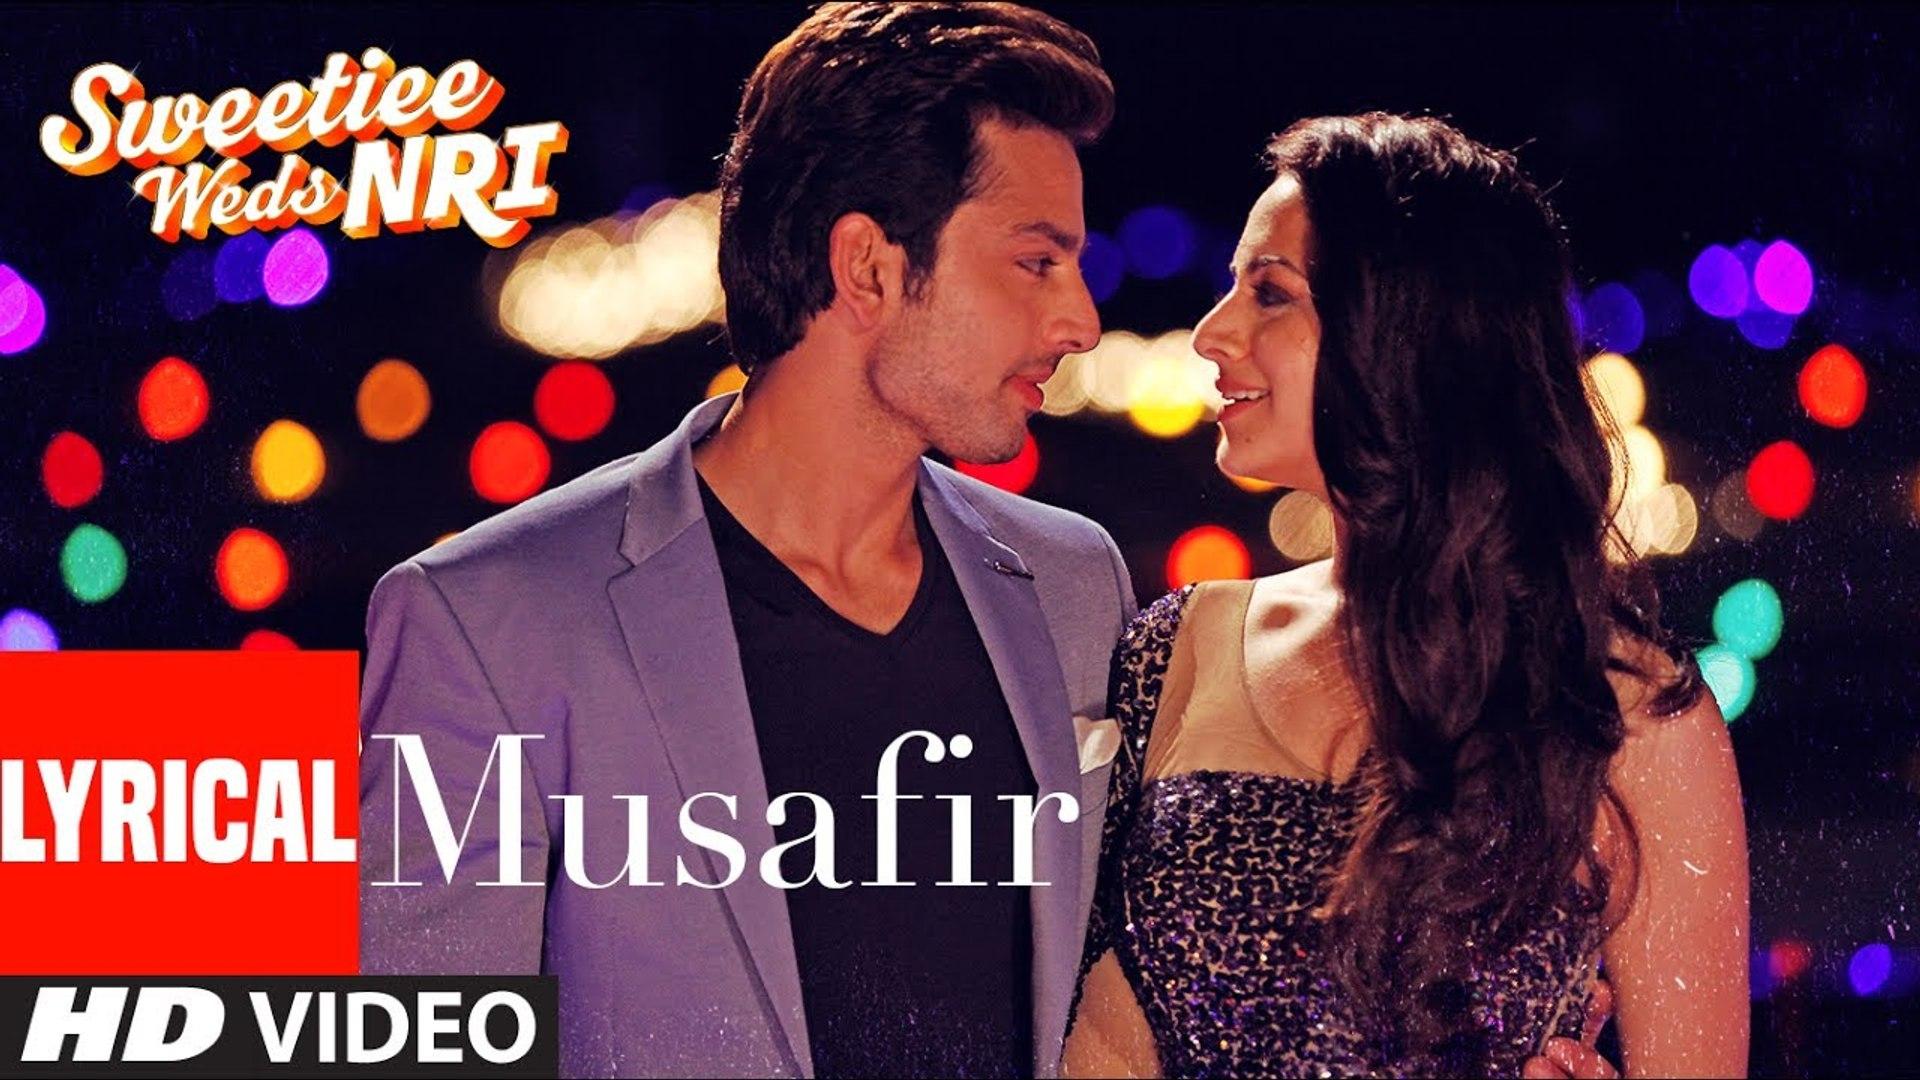 Atif Aslam: Musafir Lyrical | Sweetiee Weds NRI |Himansh Kohli, Zoya Afroz | Palak & Palash Much